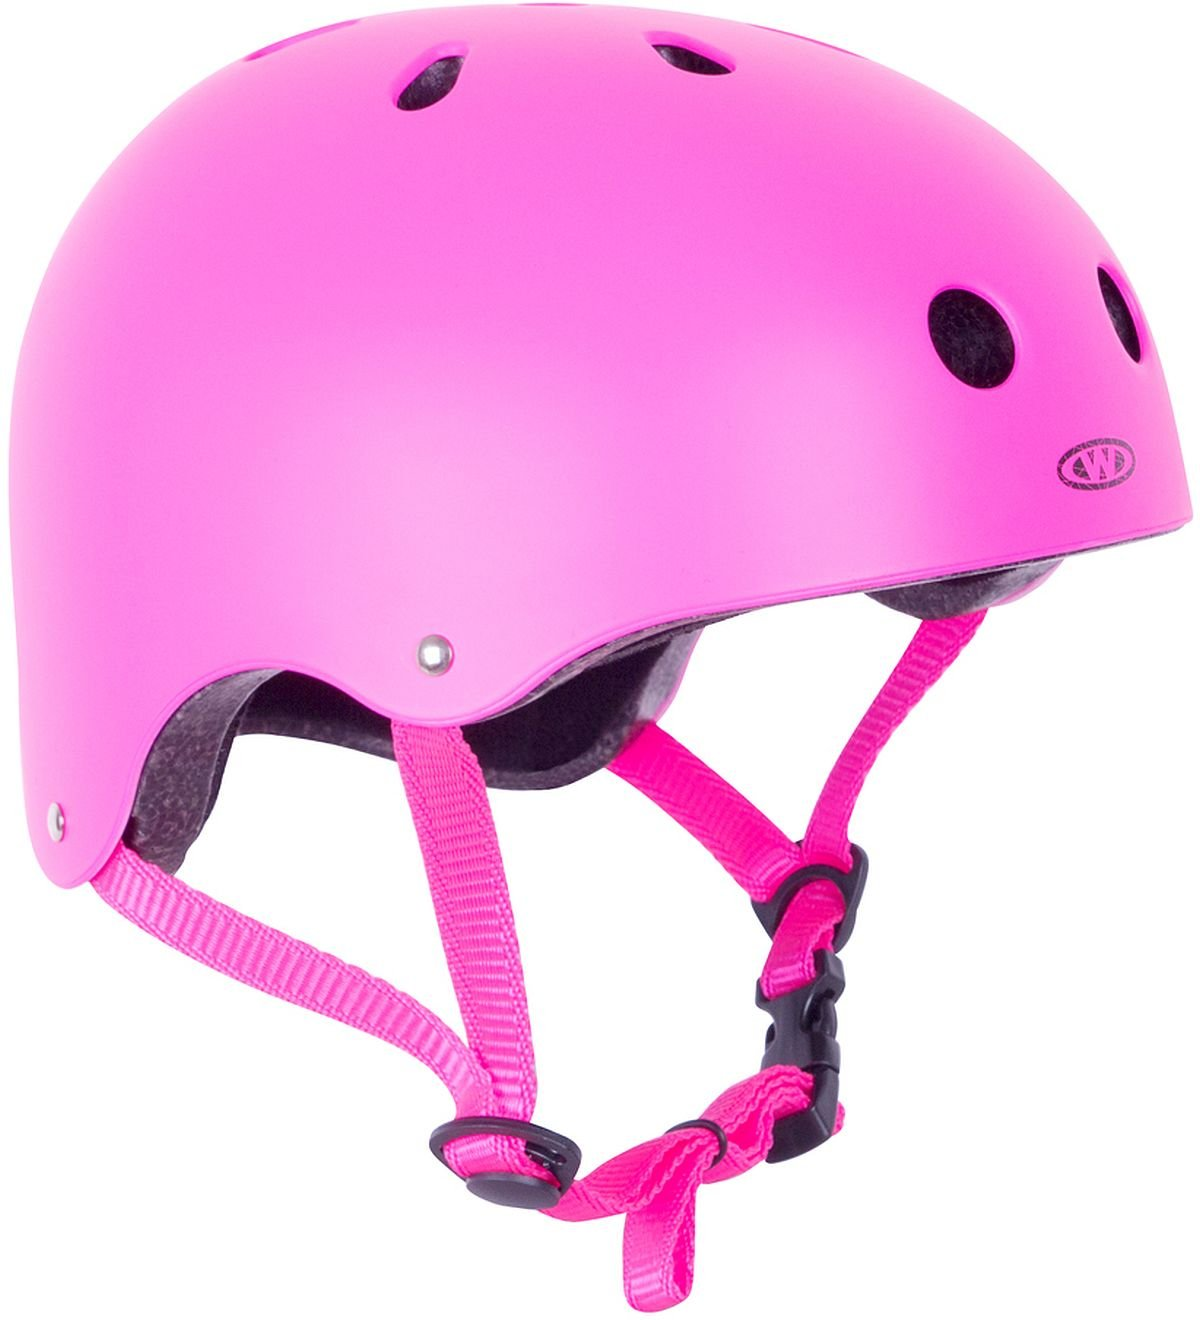 Skaterhelm Neonik pink Gr. 49-53, 53-56, 56-59, 59-62 cm verstellbar Insportline